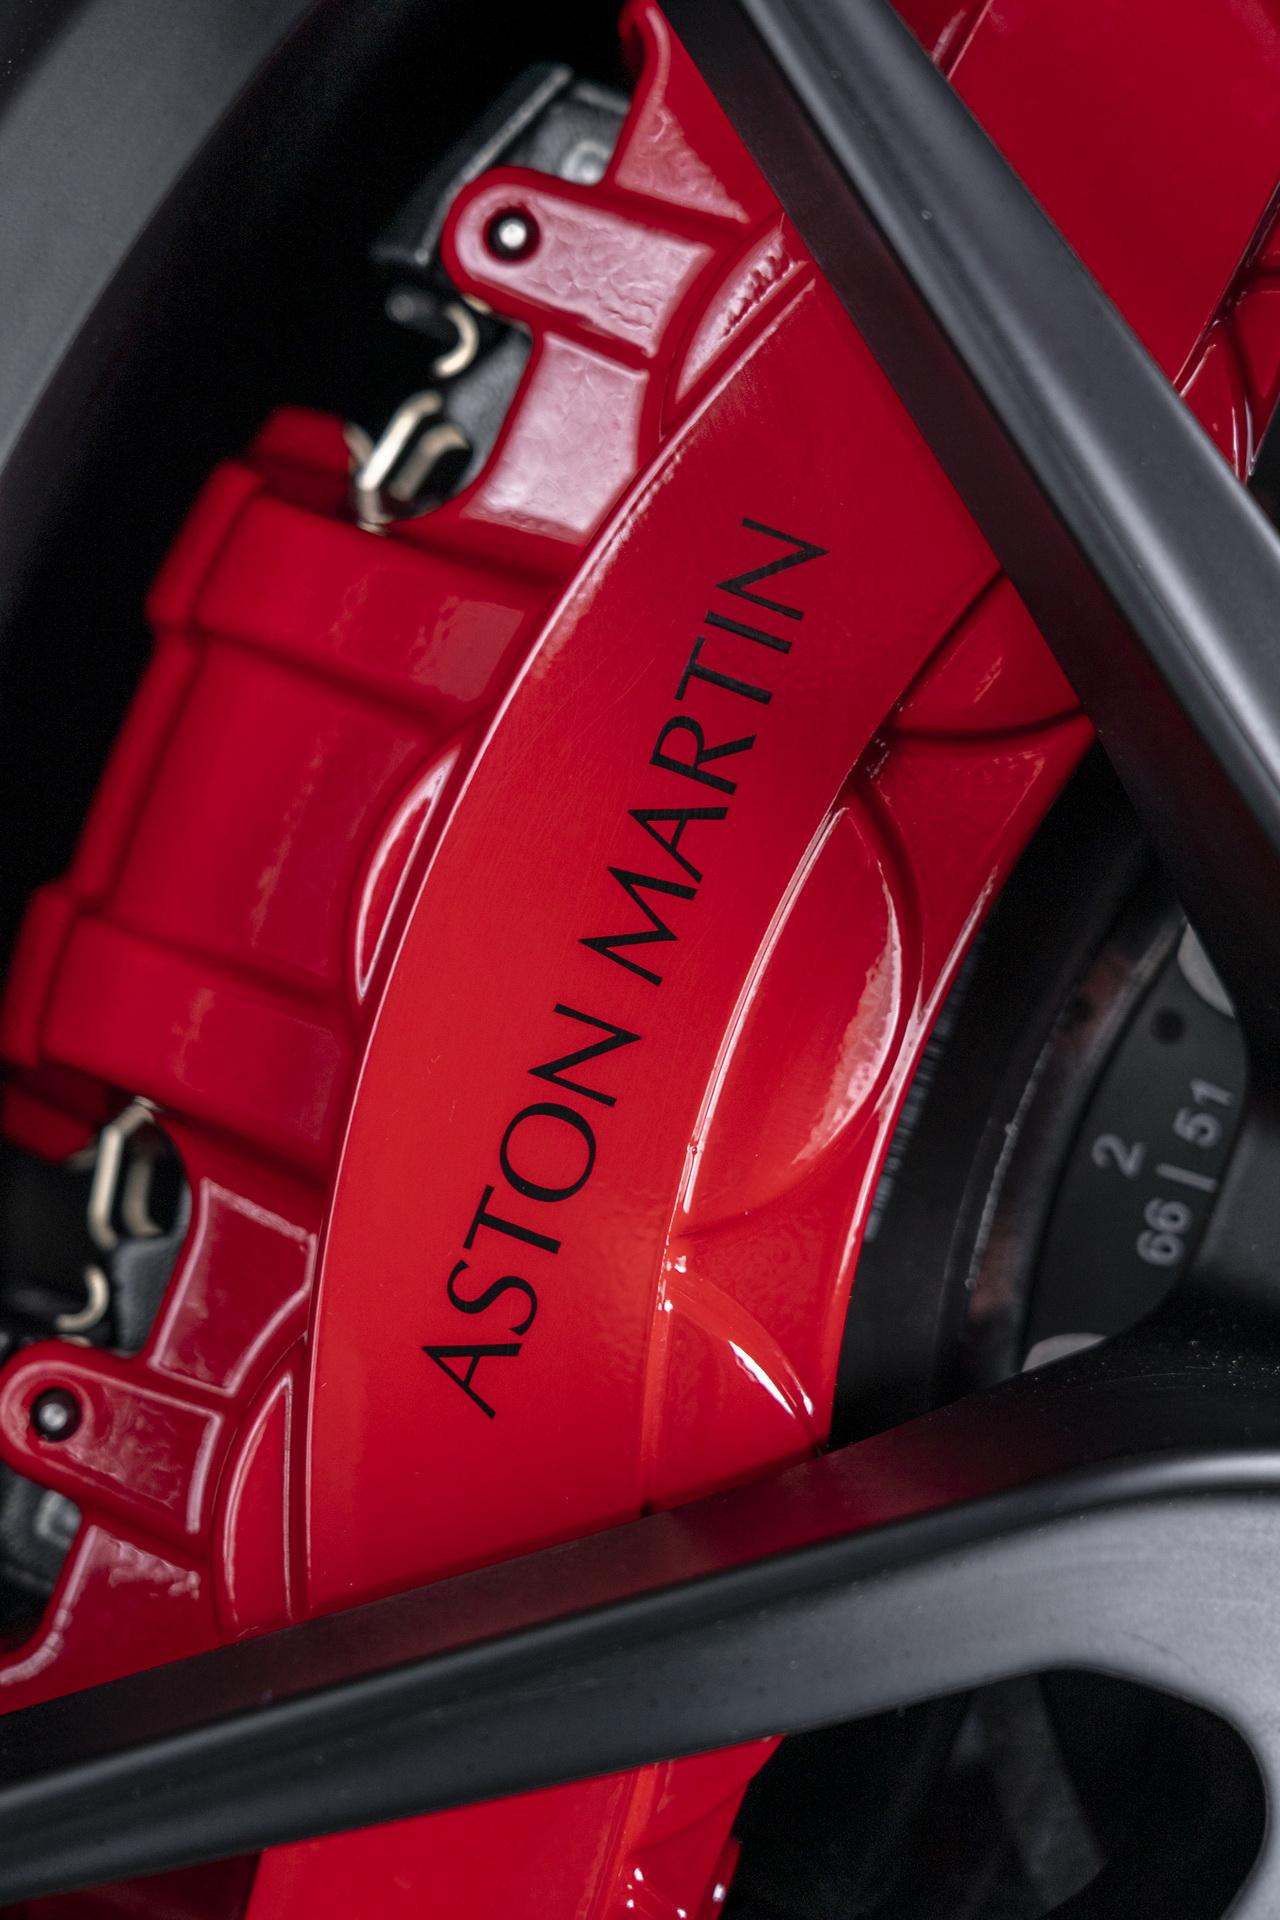 Aston_Martin_DBS_Superleggera_TAG_Heuer_Edition_0010